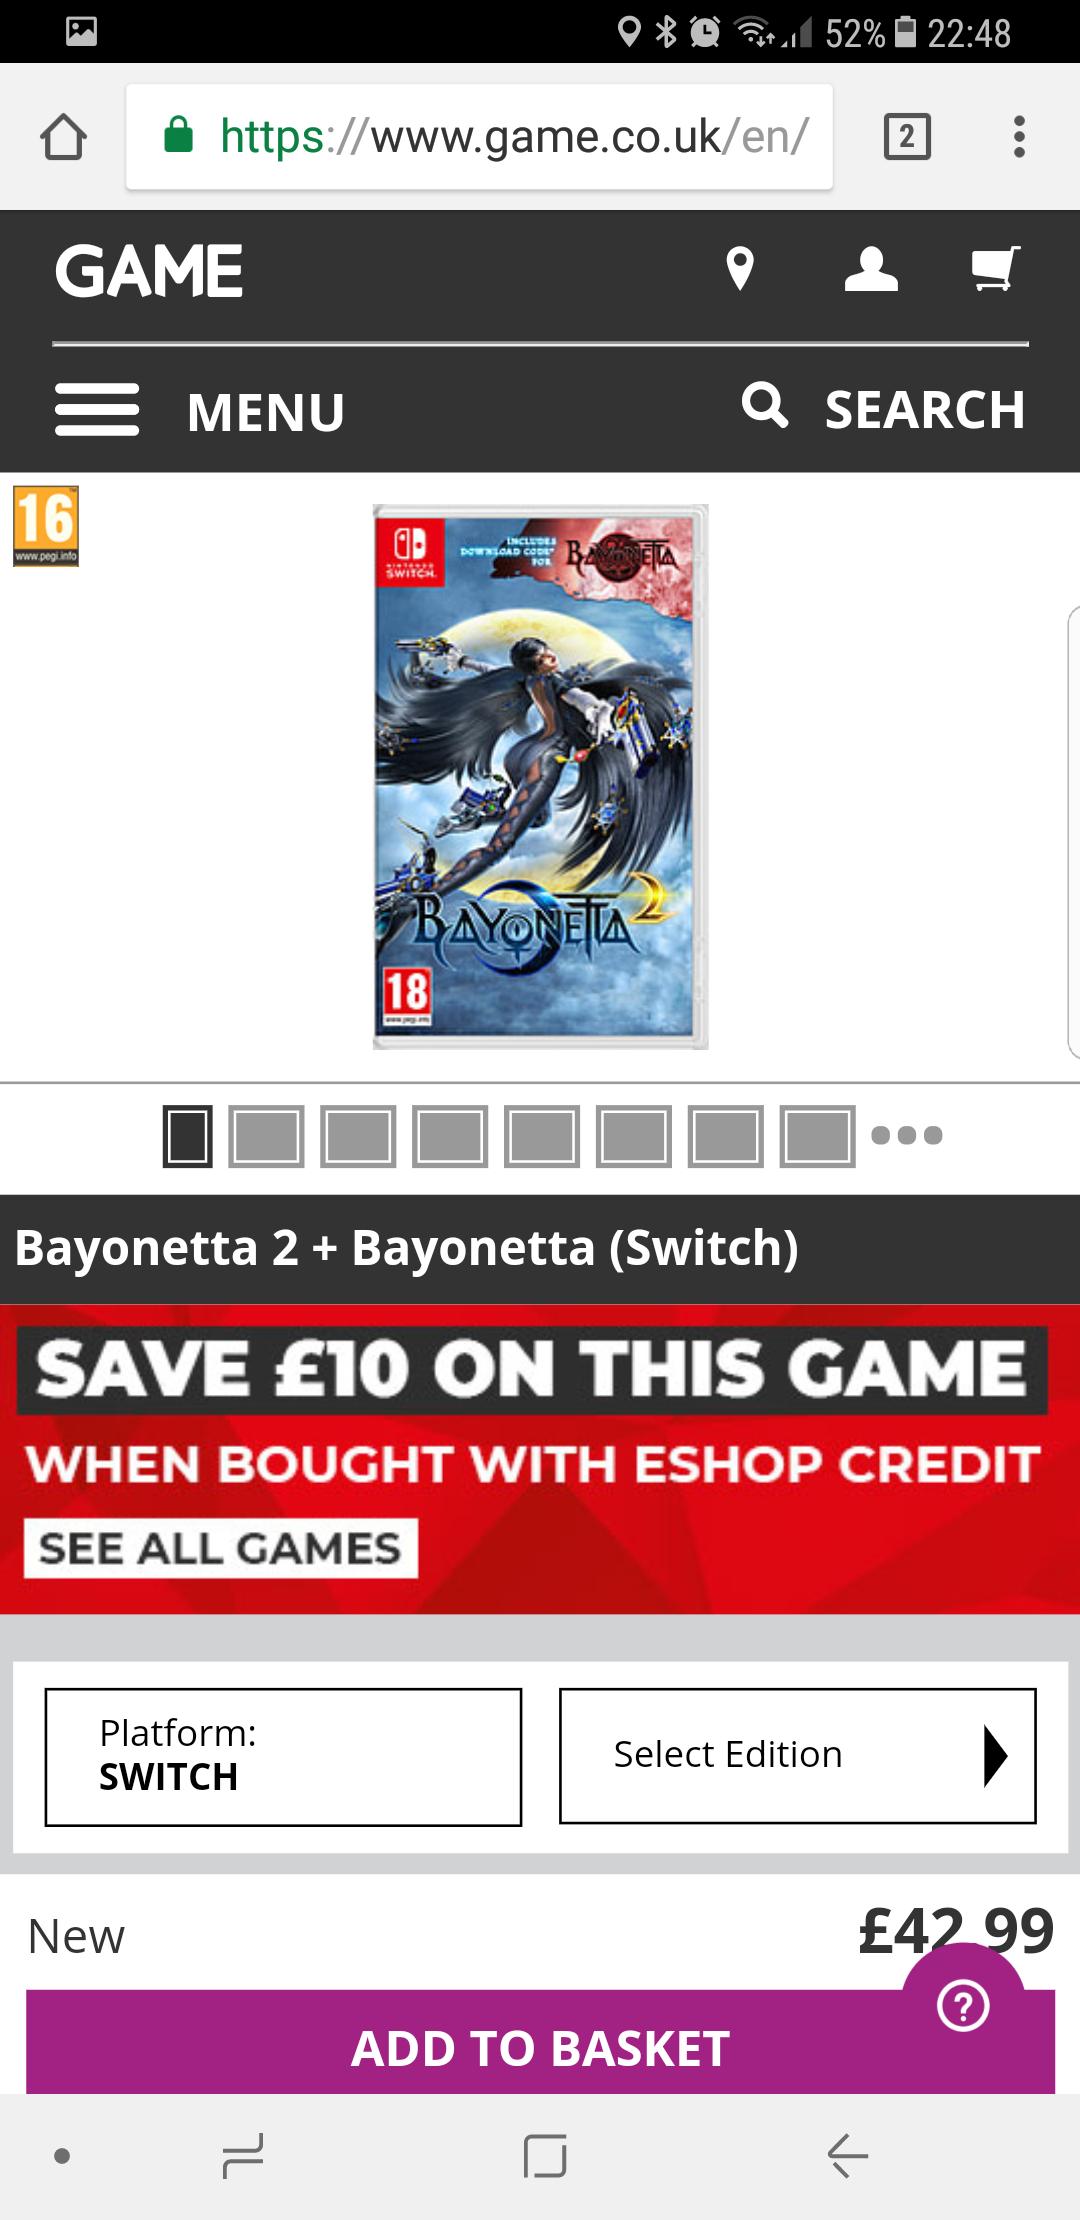 Bayonetta 2 + Bayonetta (switch) Credit Deal £32.99 at GAME (using Nintendo Store Credit = £15.00)